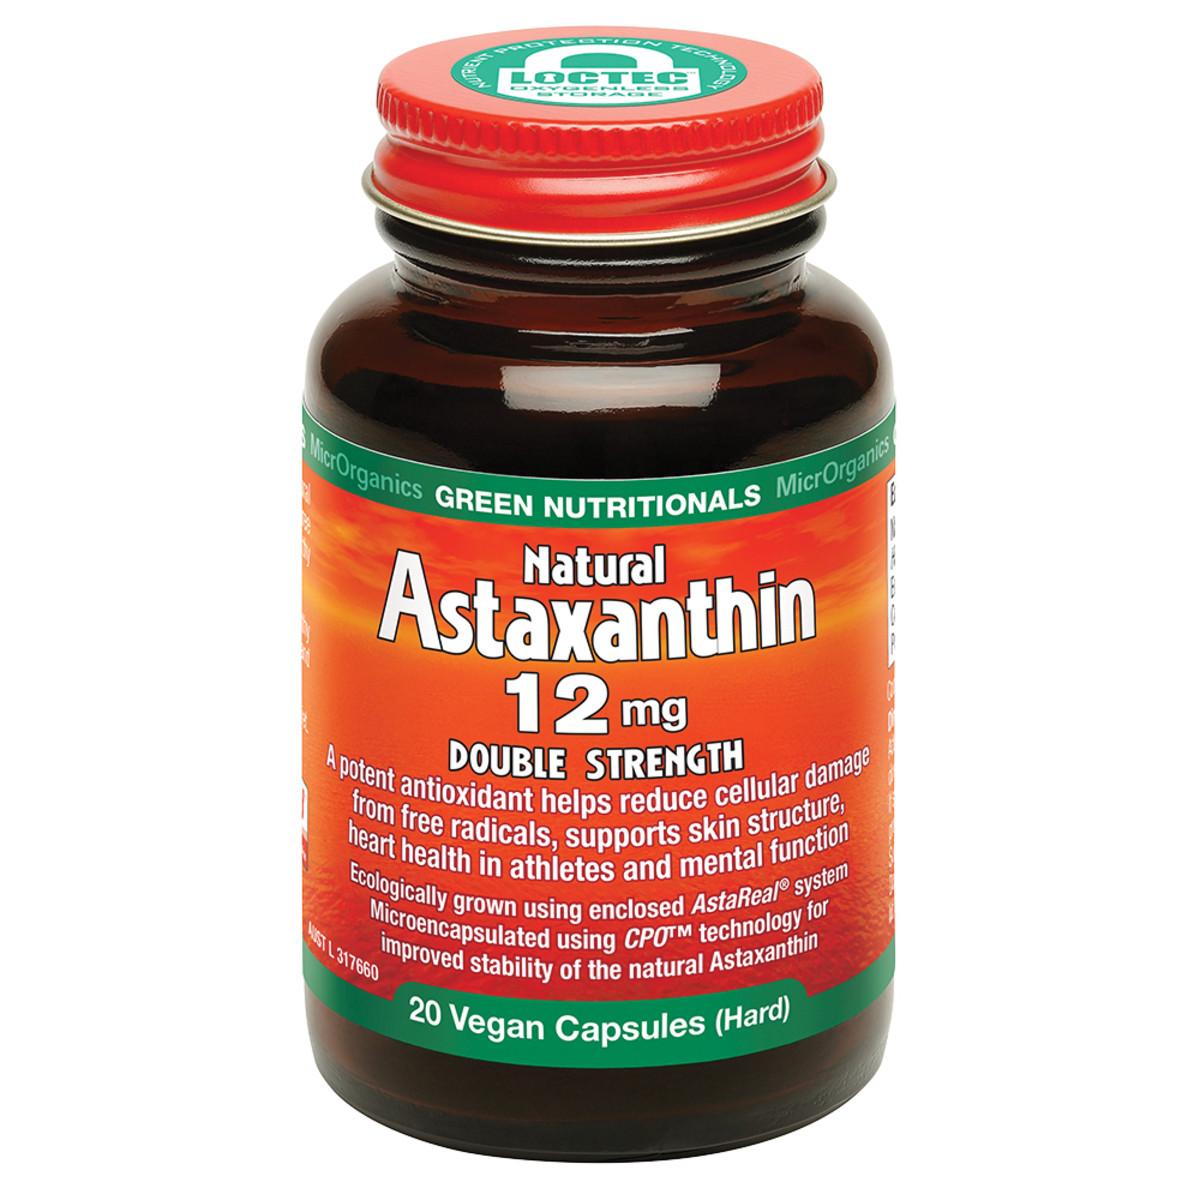 MICRORGANICS GREEN NUTRITIONALS NATURAL ASTAXANTHIN 12MG DOUBLE STRENGTH 20 VEGAN CAPSULES (HARD)